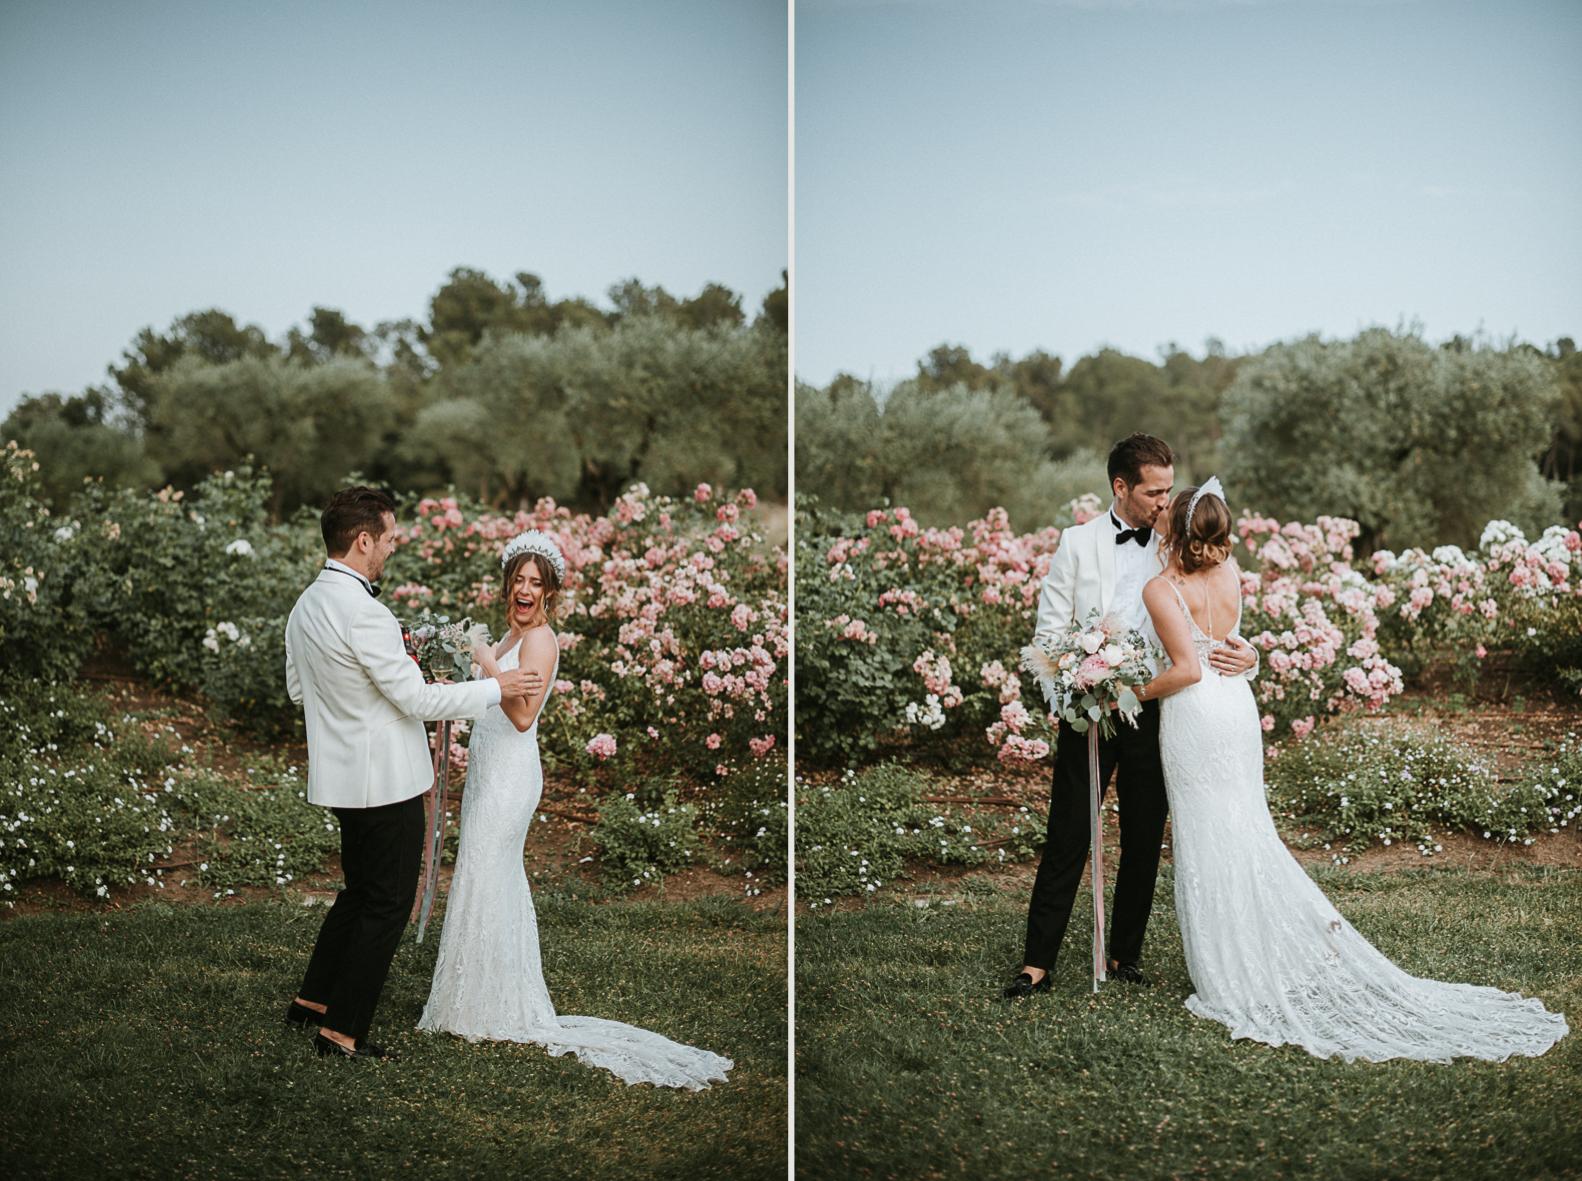 miks-sels-mas-terrats-girona-wedding-photographer-68.1